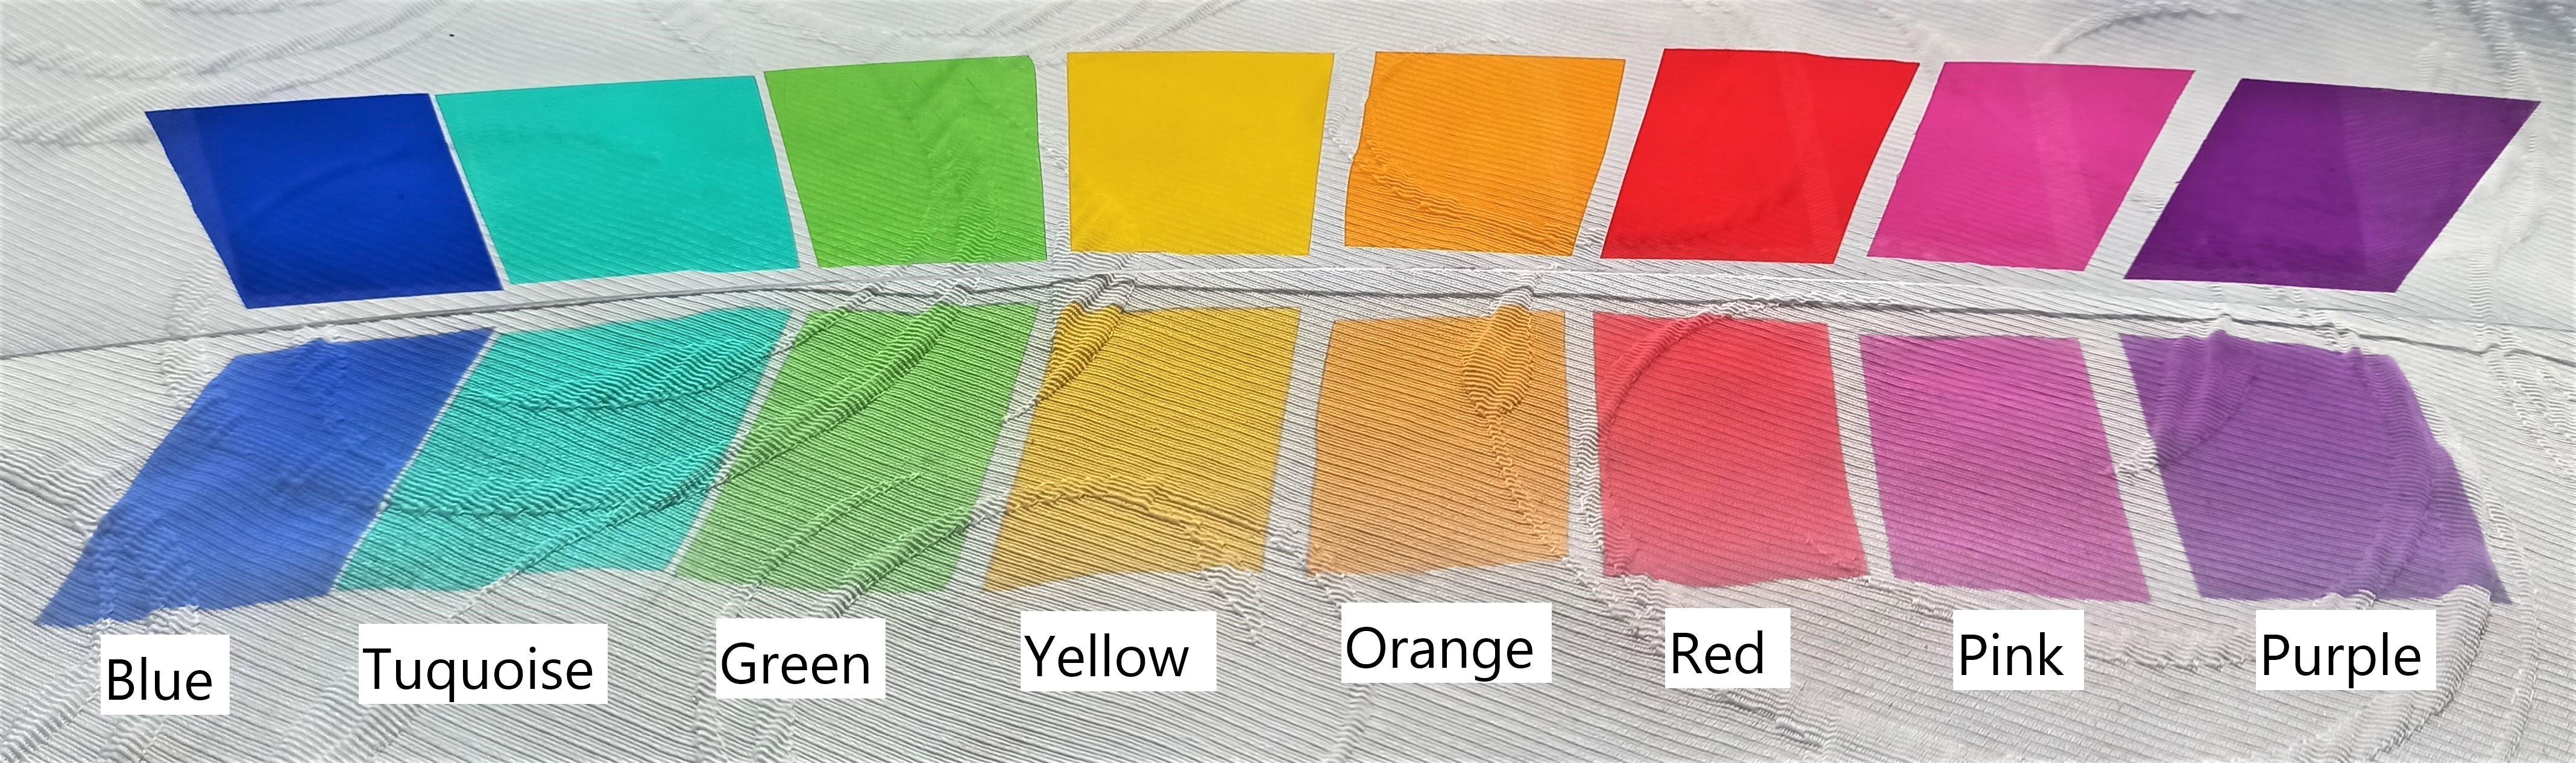 transluscent-colour-chart.jpg